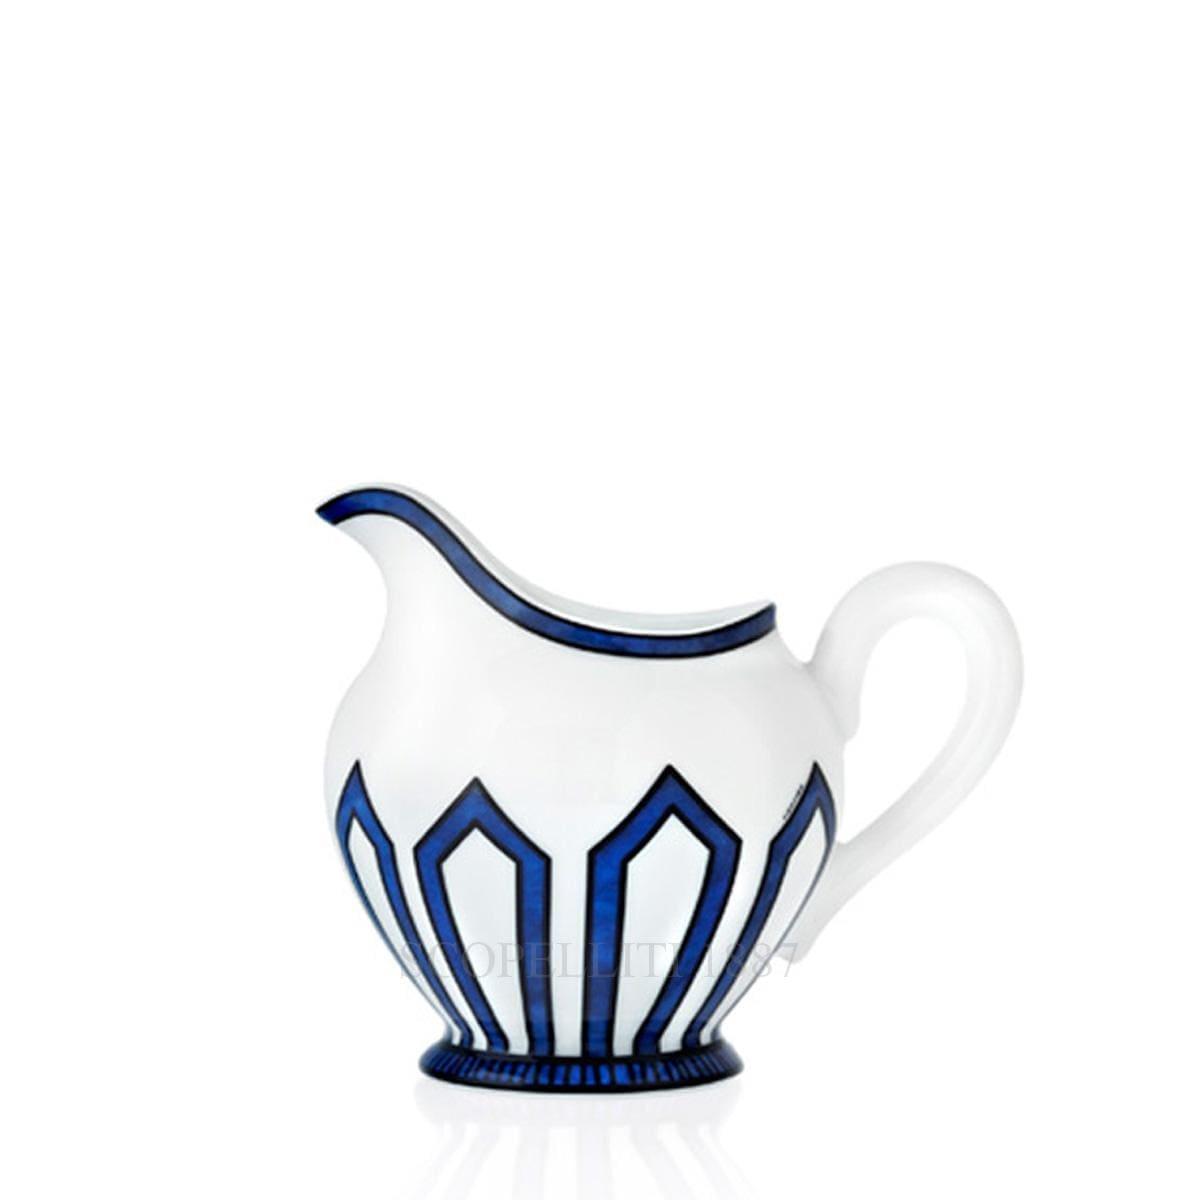 hermes paris bleus dailleurs designer porcelain creamer